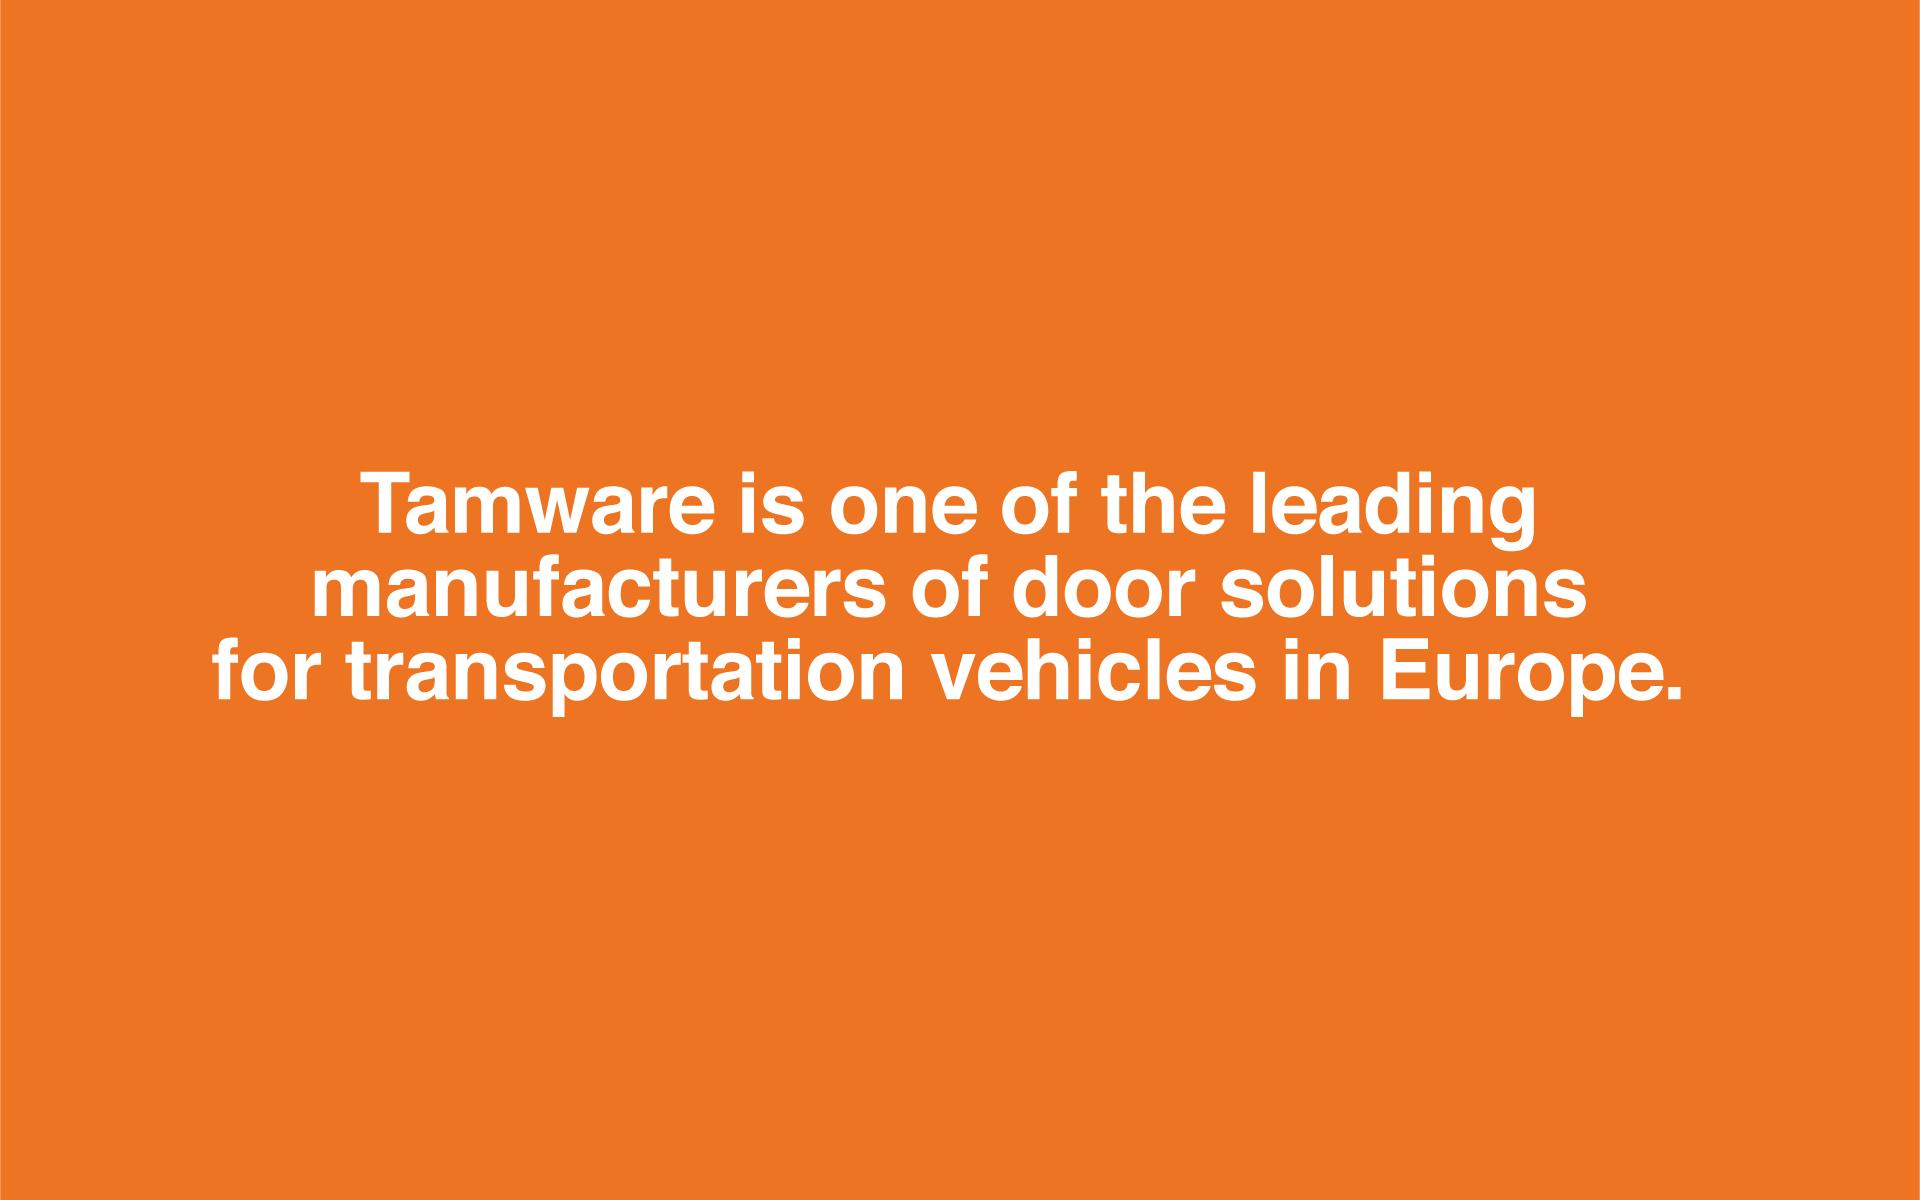 tamware_text